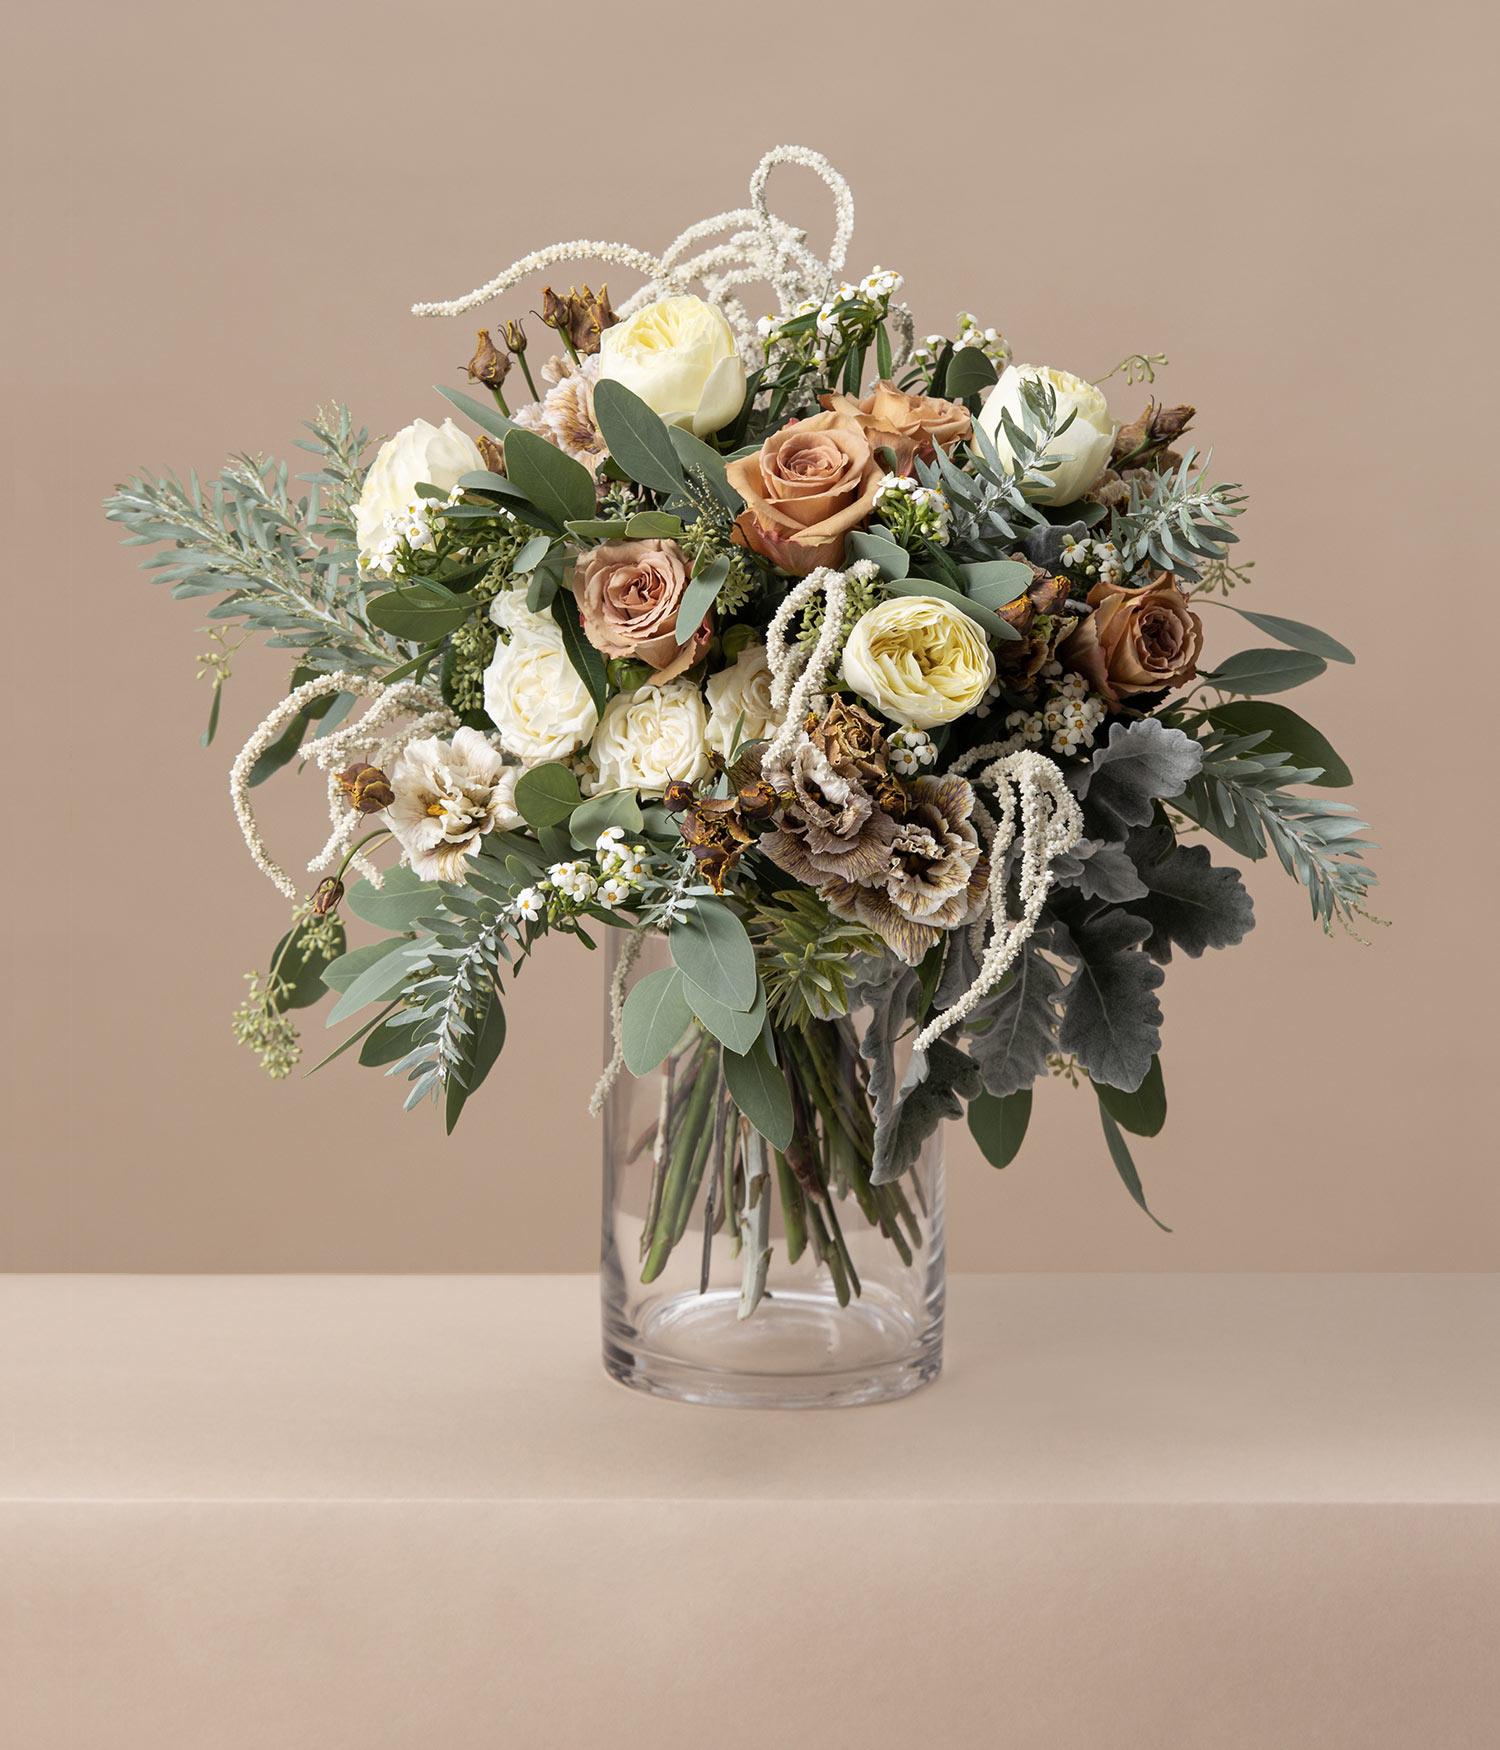 Cafe Au Lait Garden Rose and Eustoma flower bouquet by flannel flowers florist